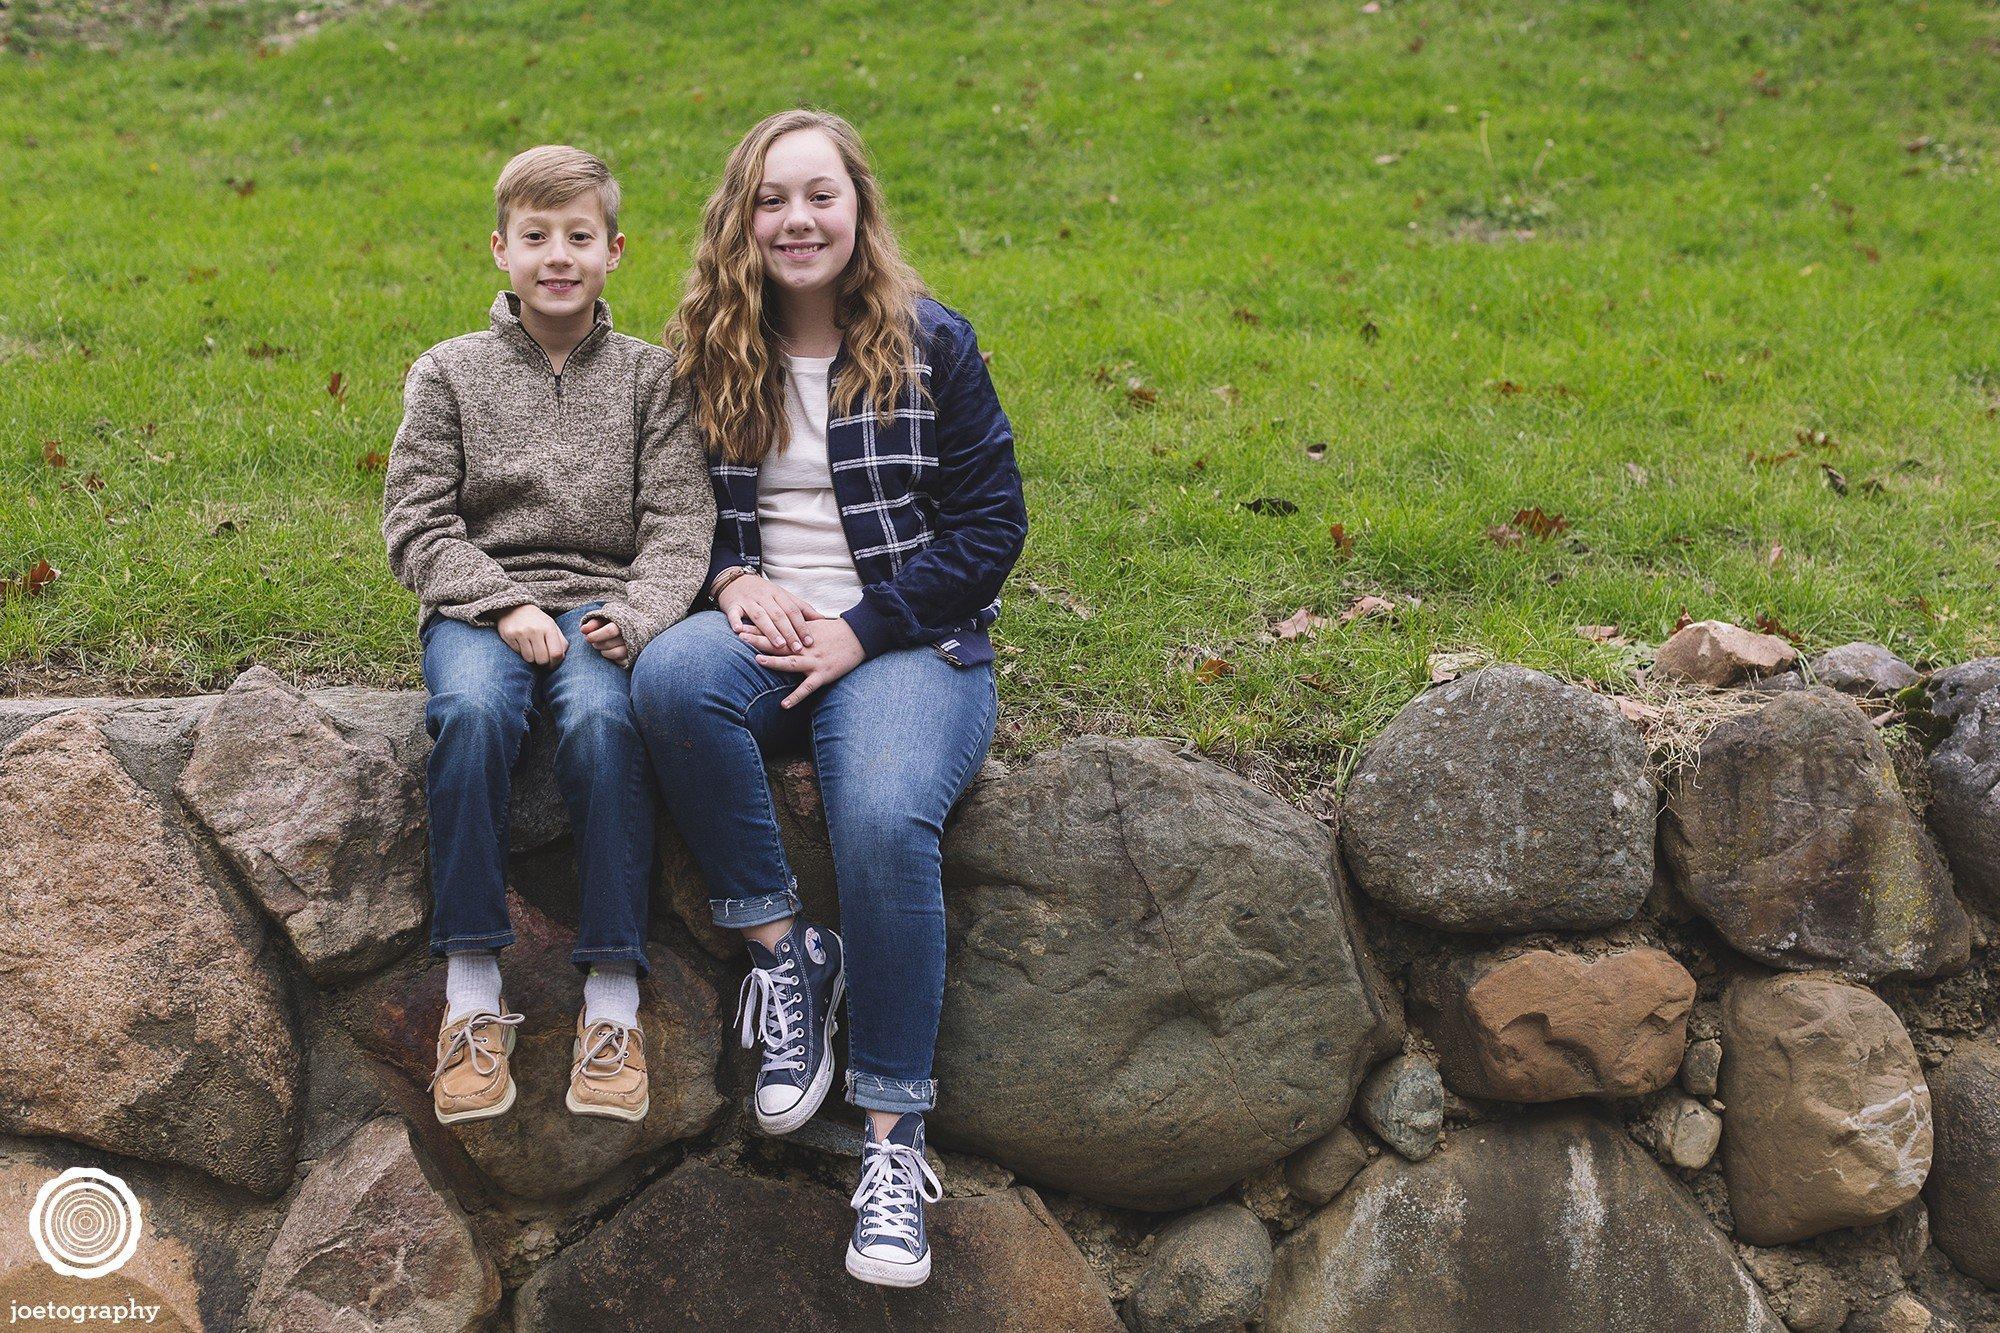 Teeple Family Photographs   Indianapolis - 7